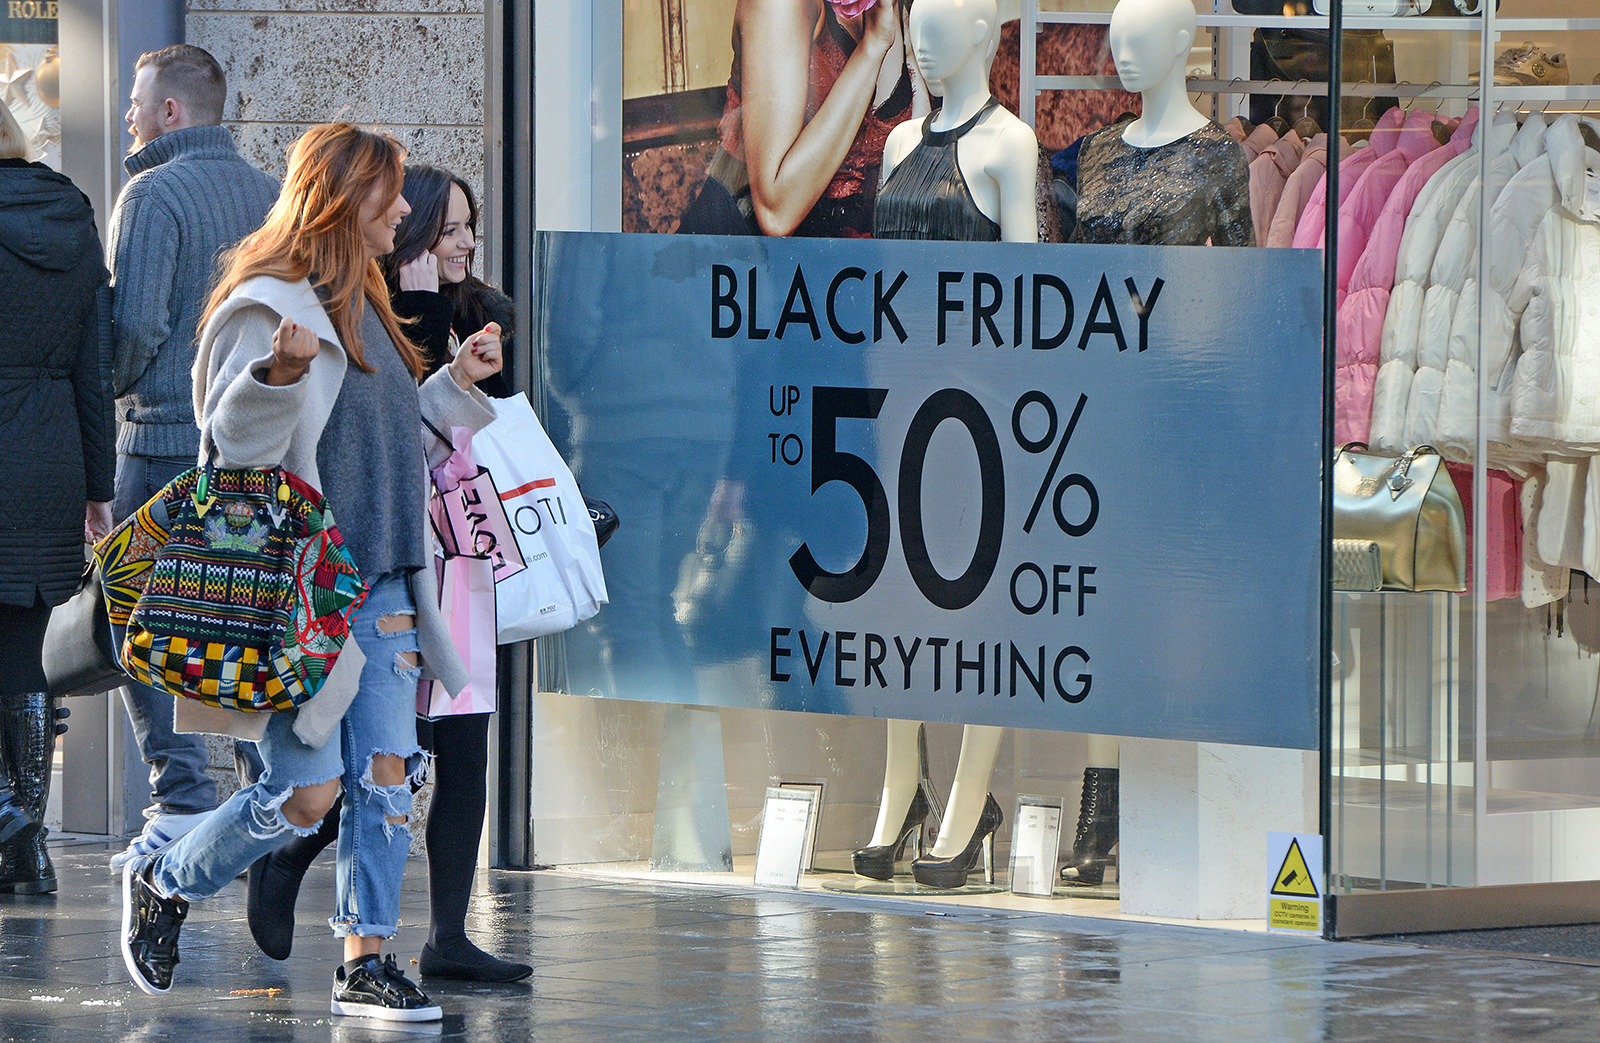 Today S Best Black Friday Deals 179 Roomba 24 Roku Sonos Sale 7 Smart Plugs 144 Amazon Device Deals More Bgr